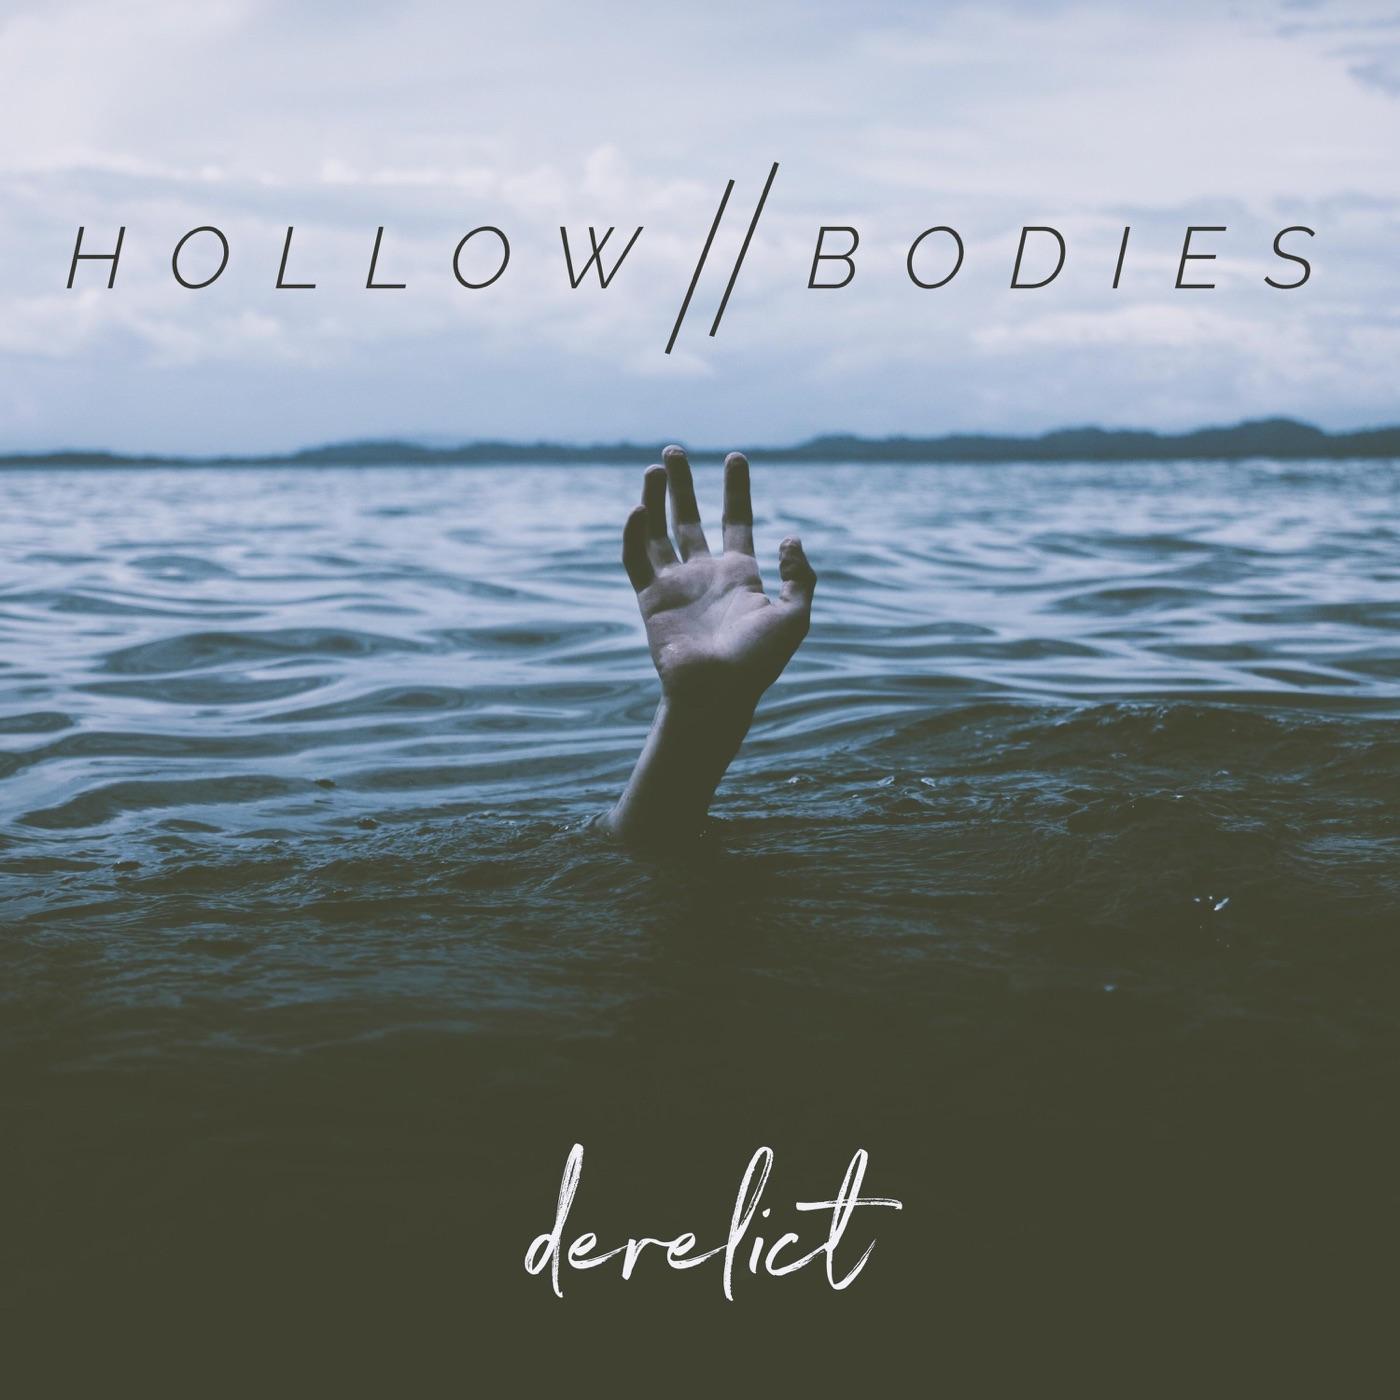 Hollow//Bodies - Derelict [Single] (2018)